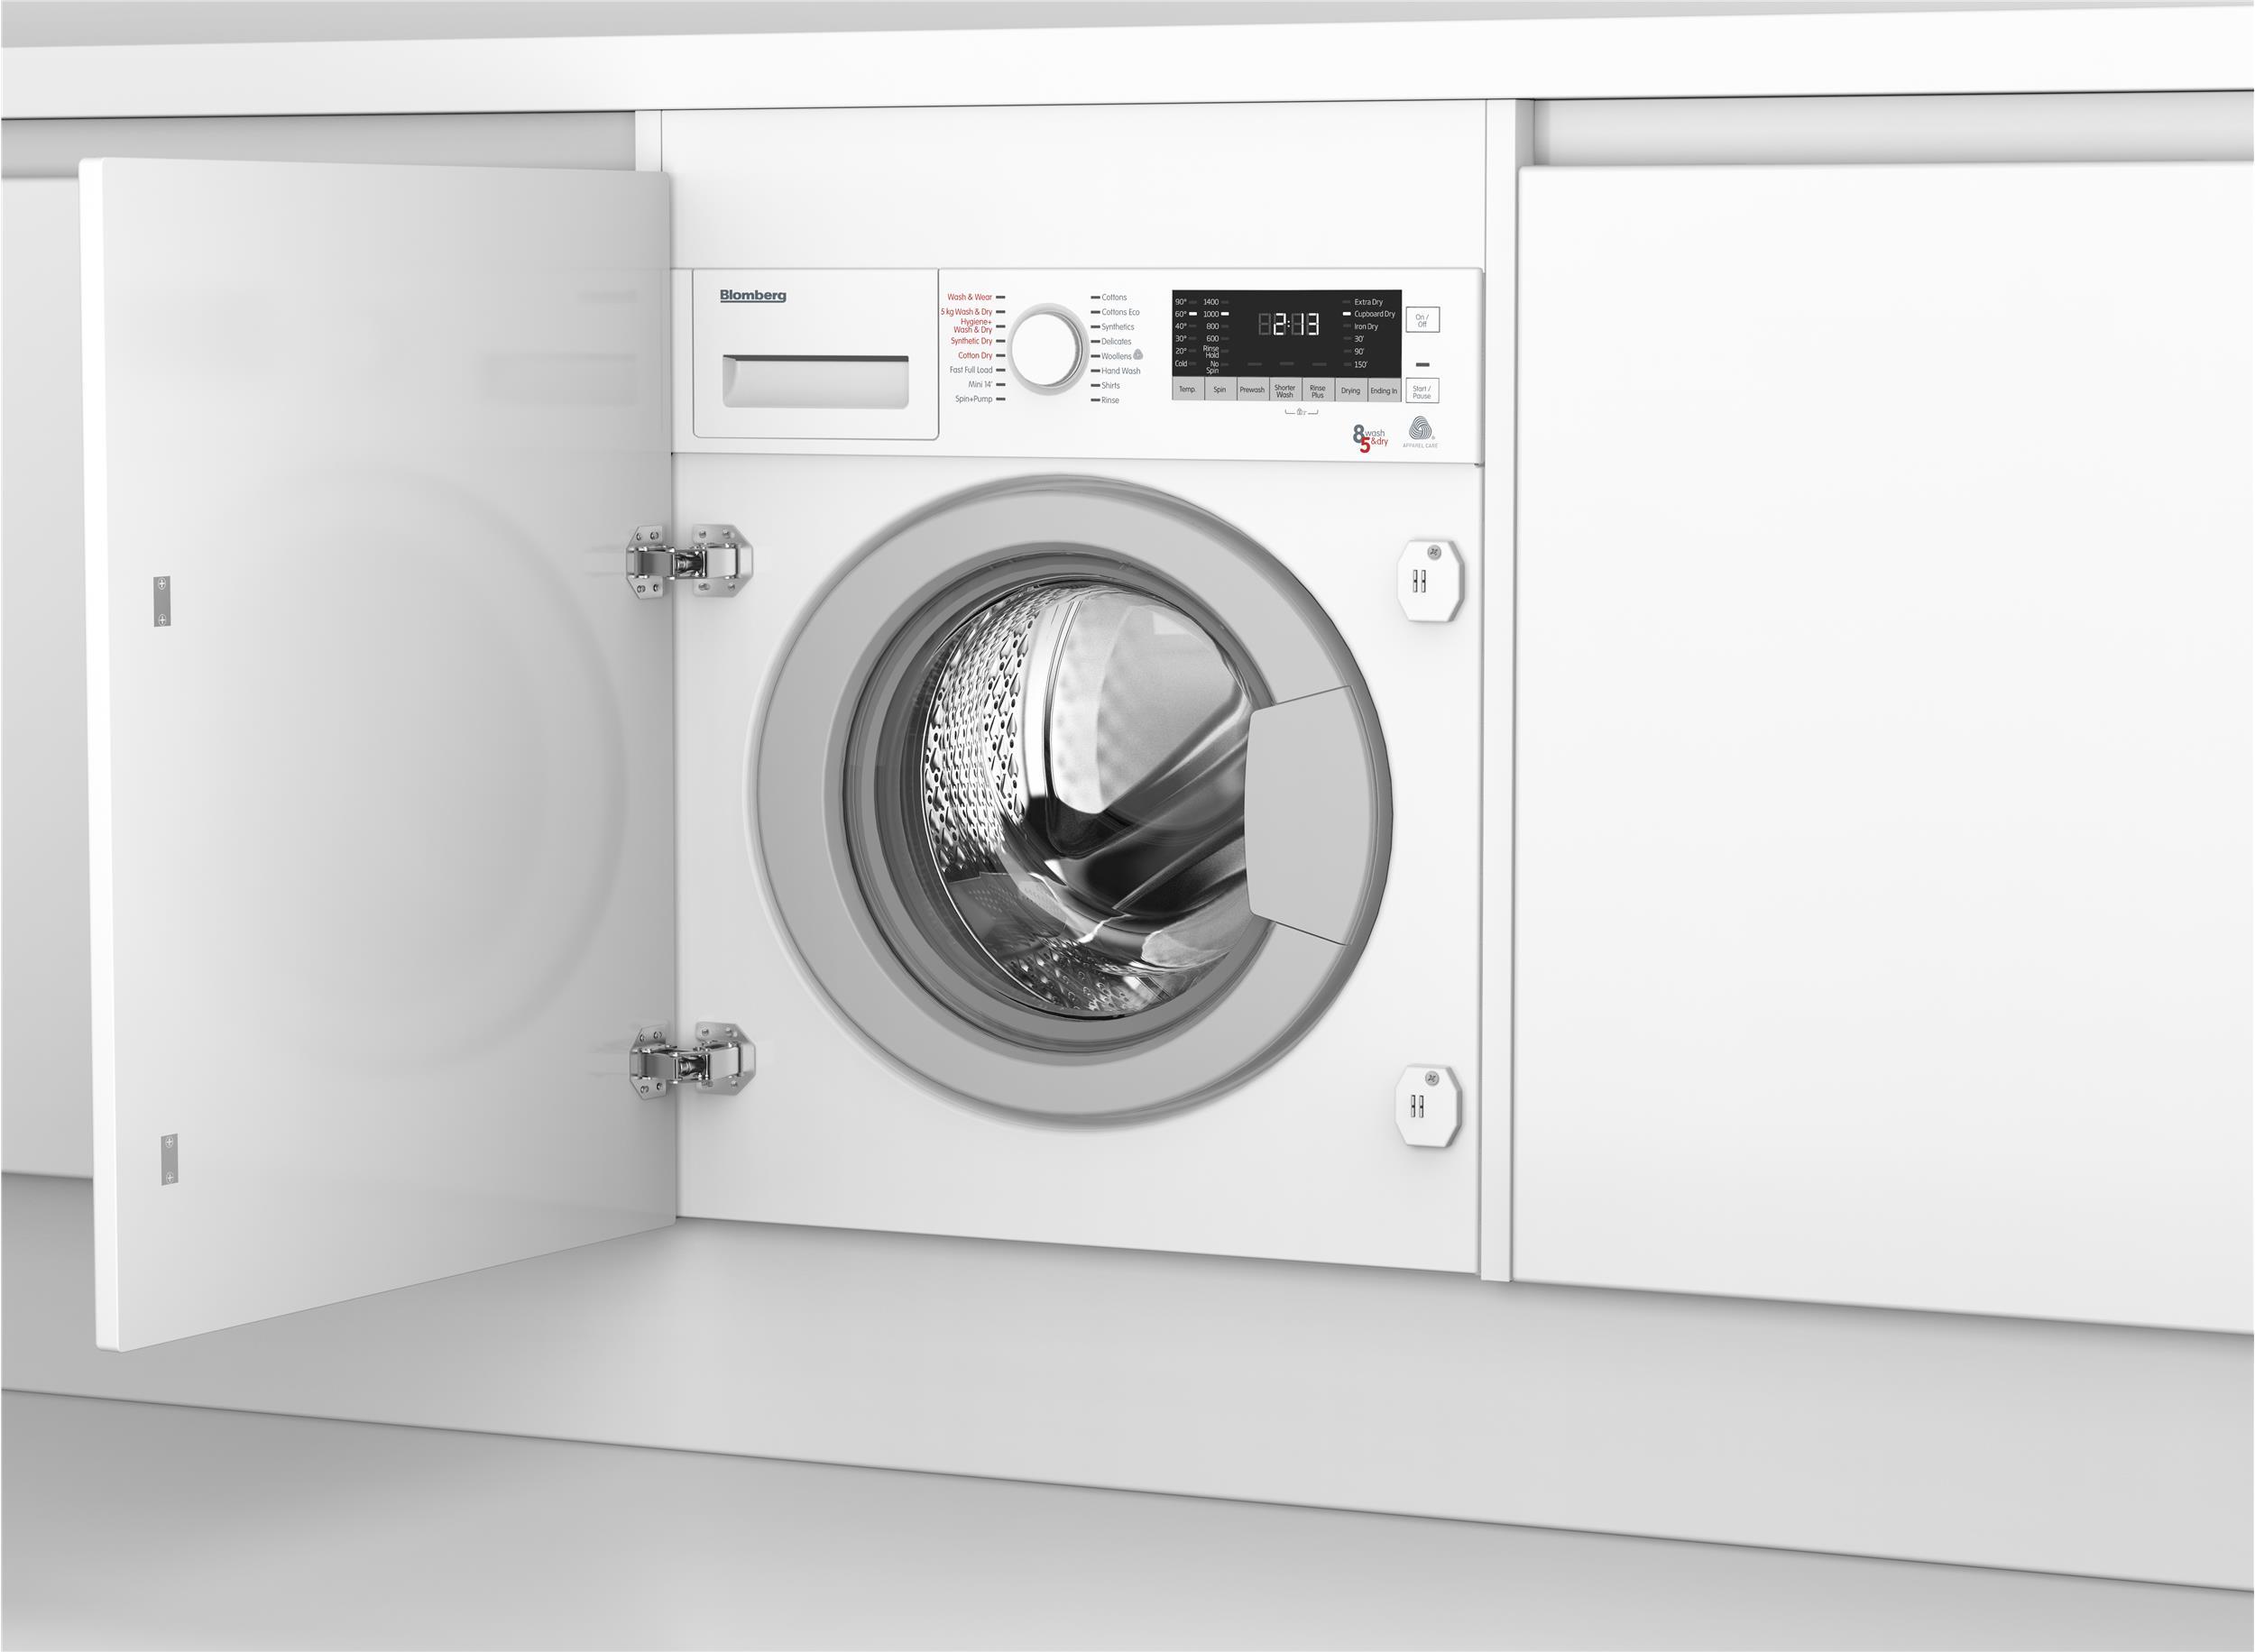 lri285411 integrated washer dryer with 8kg 5kg capacity. Black Bedroom Furniture Sets. Home Design Ideas